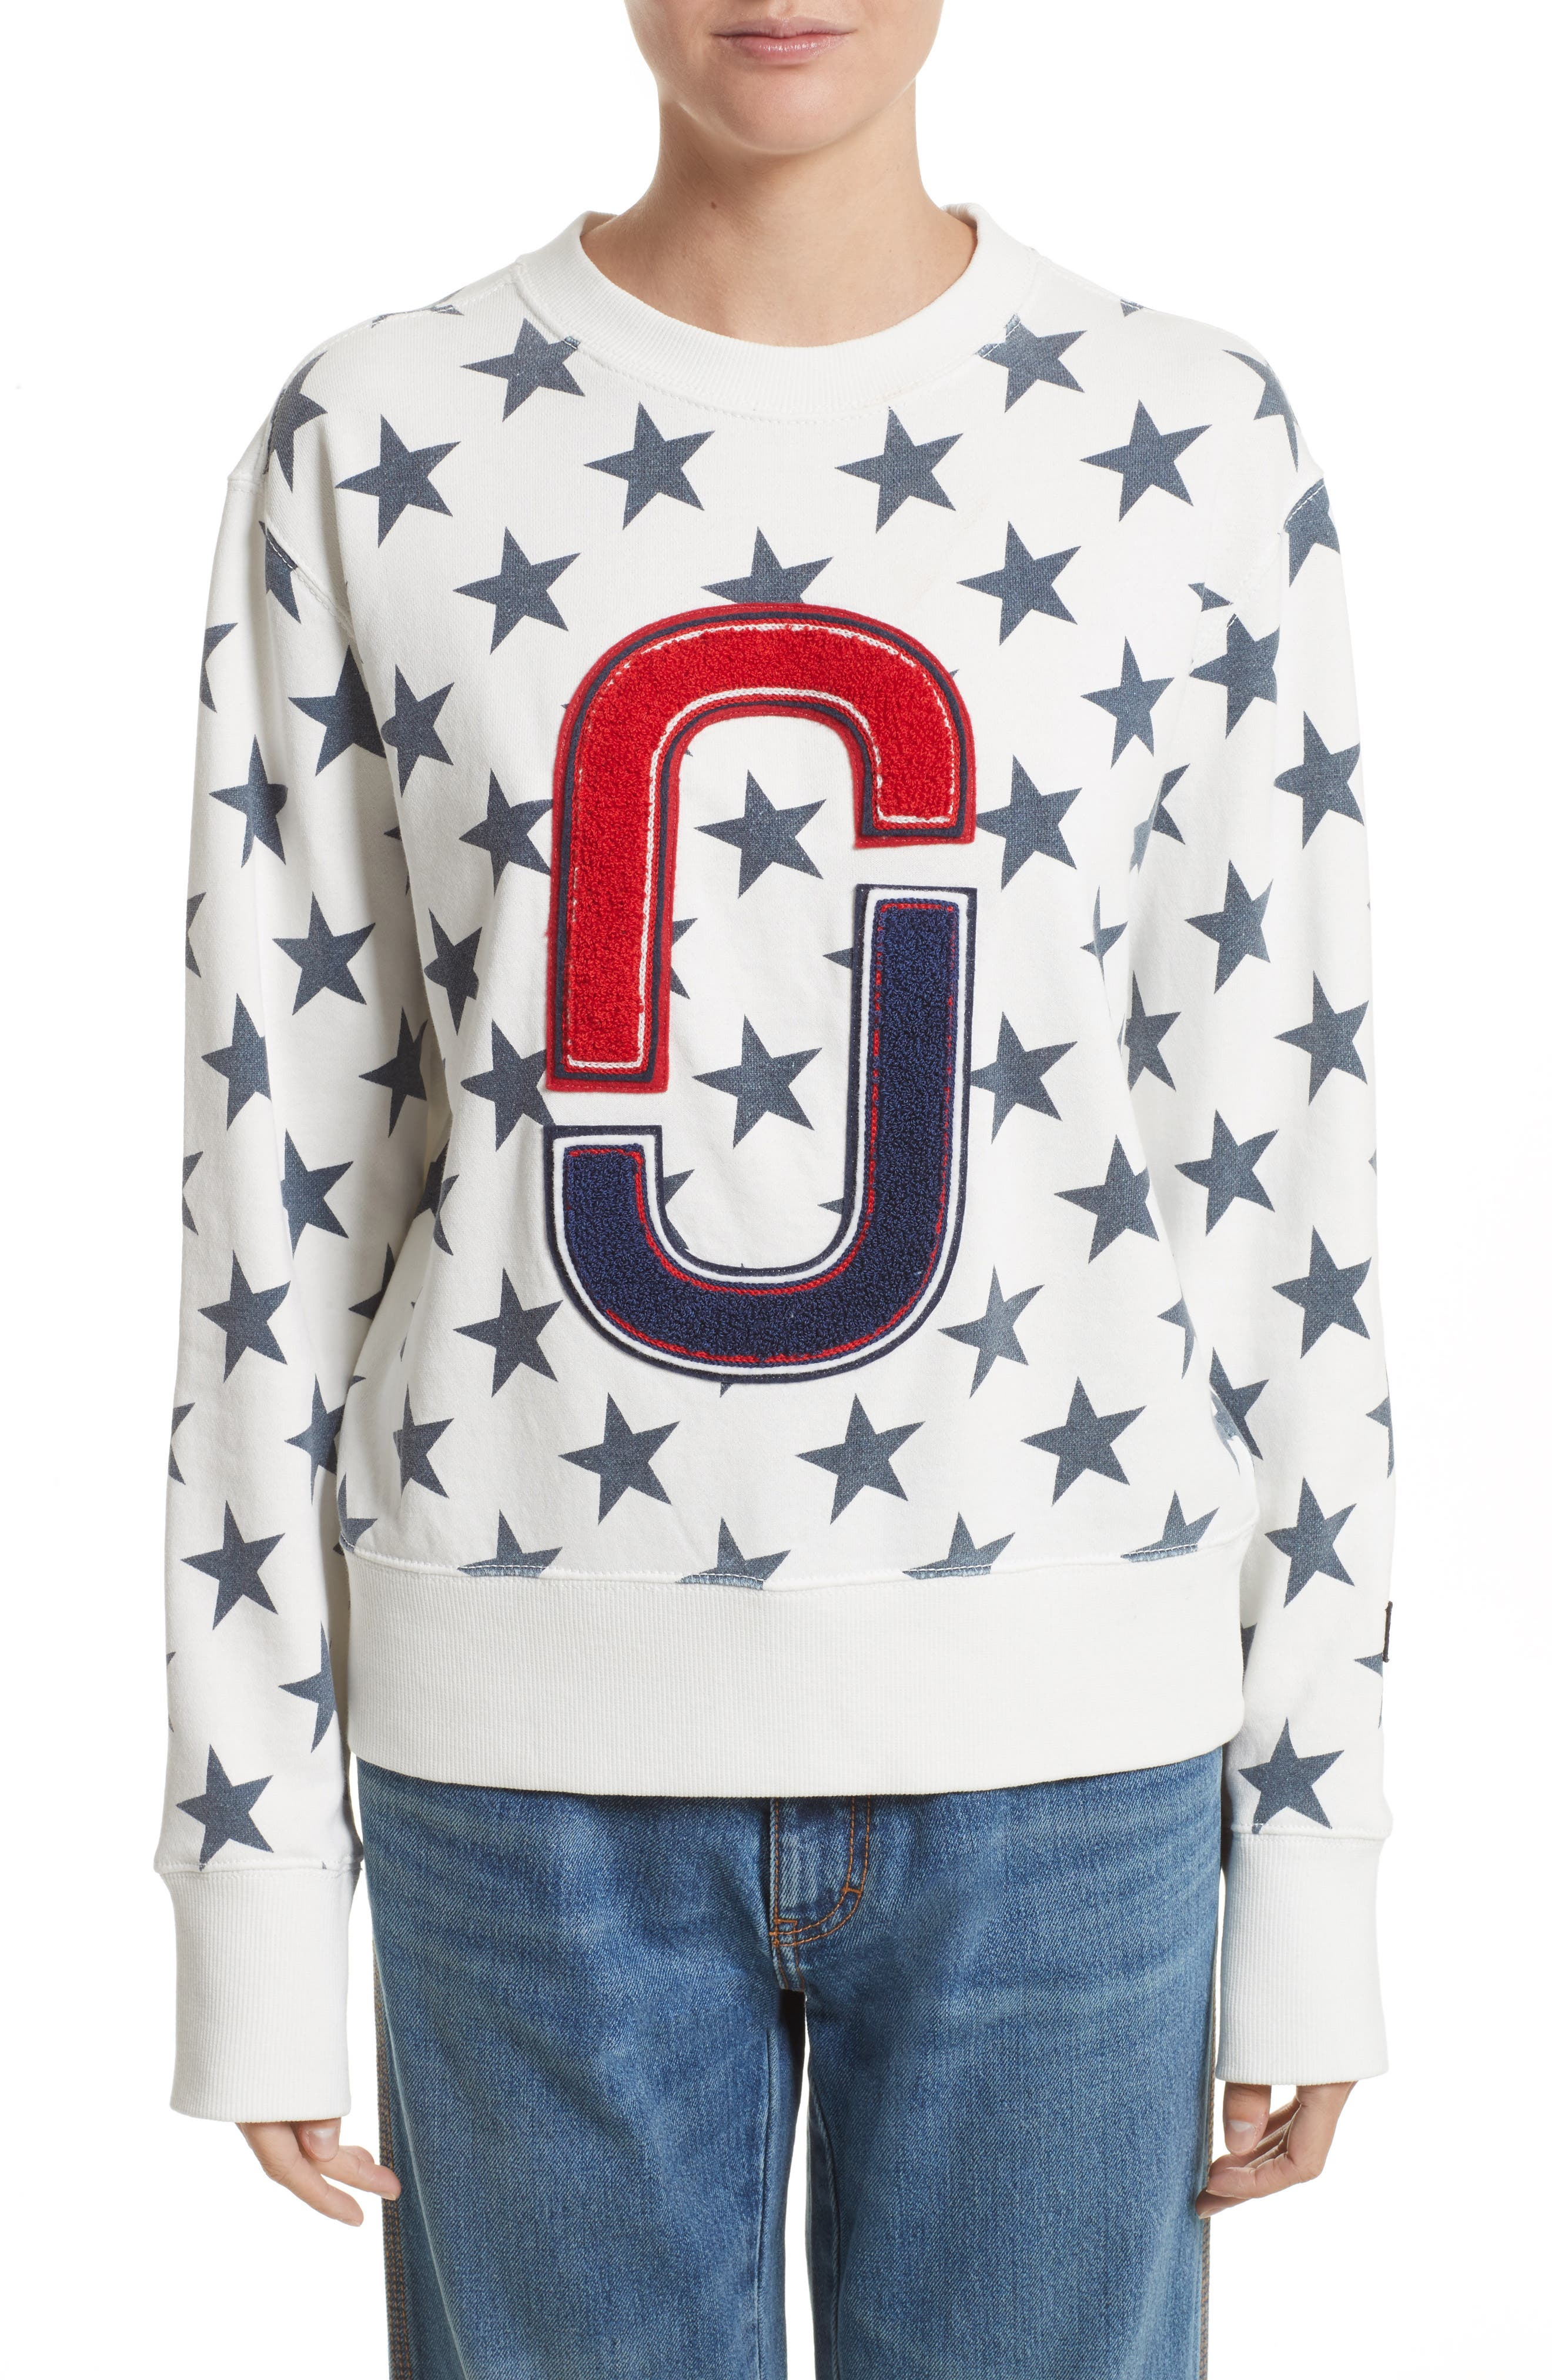 '90s Star Print Sweatshirt,                             Main thumbnail 1, color,                             900